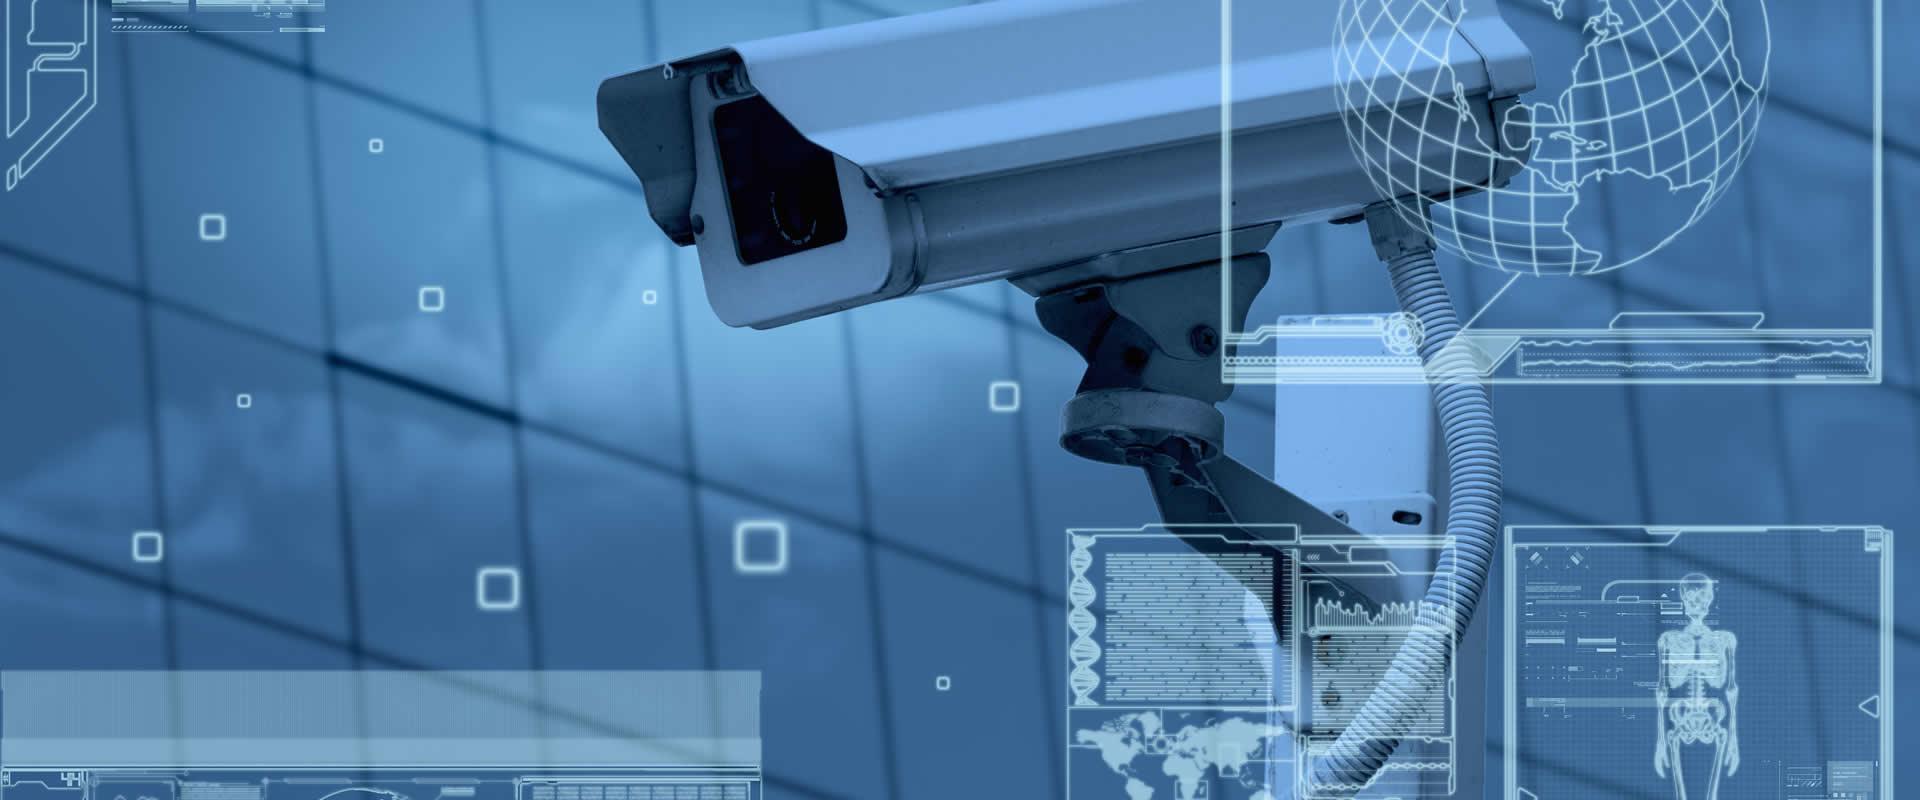 Wireless Security Enterprise